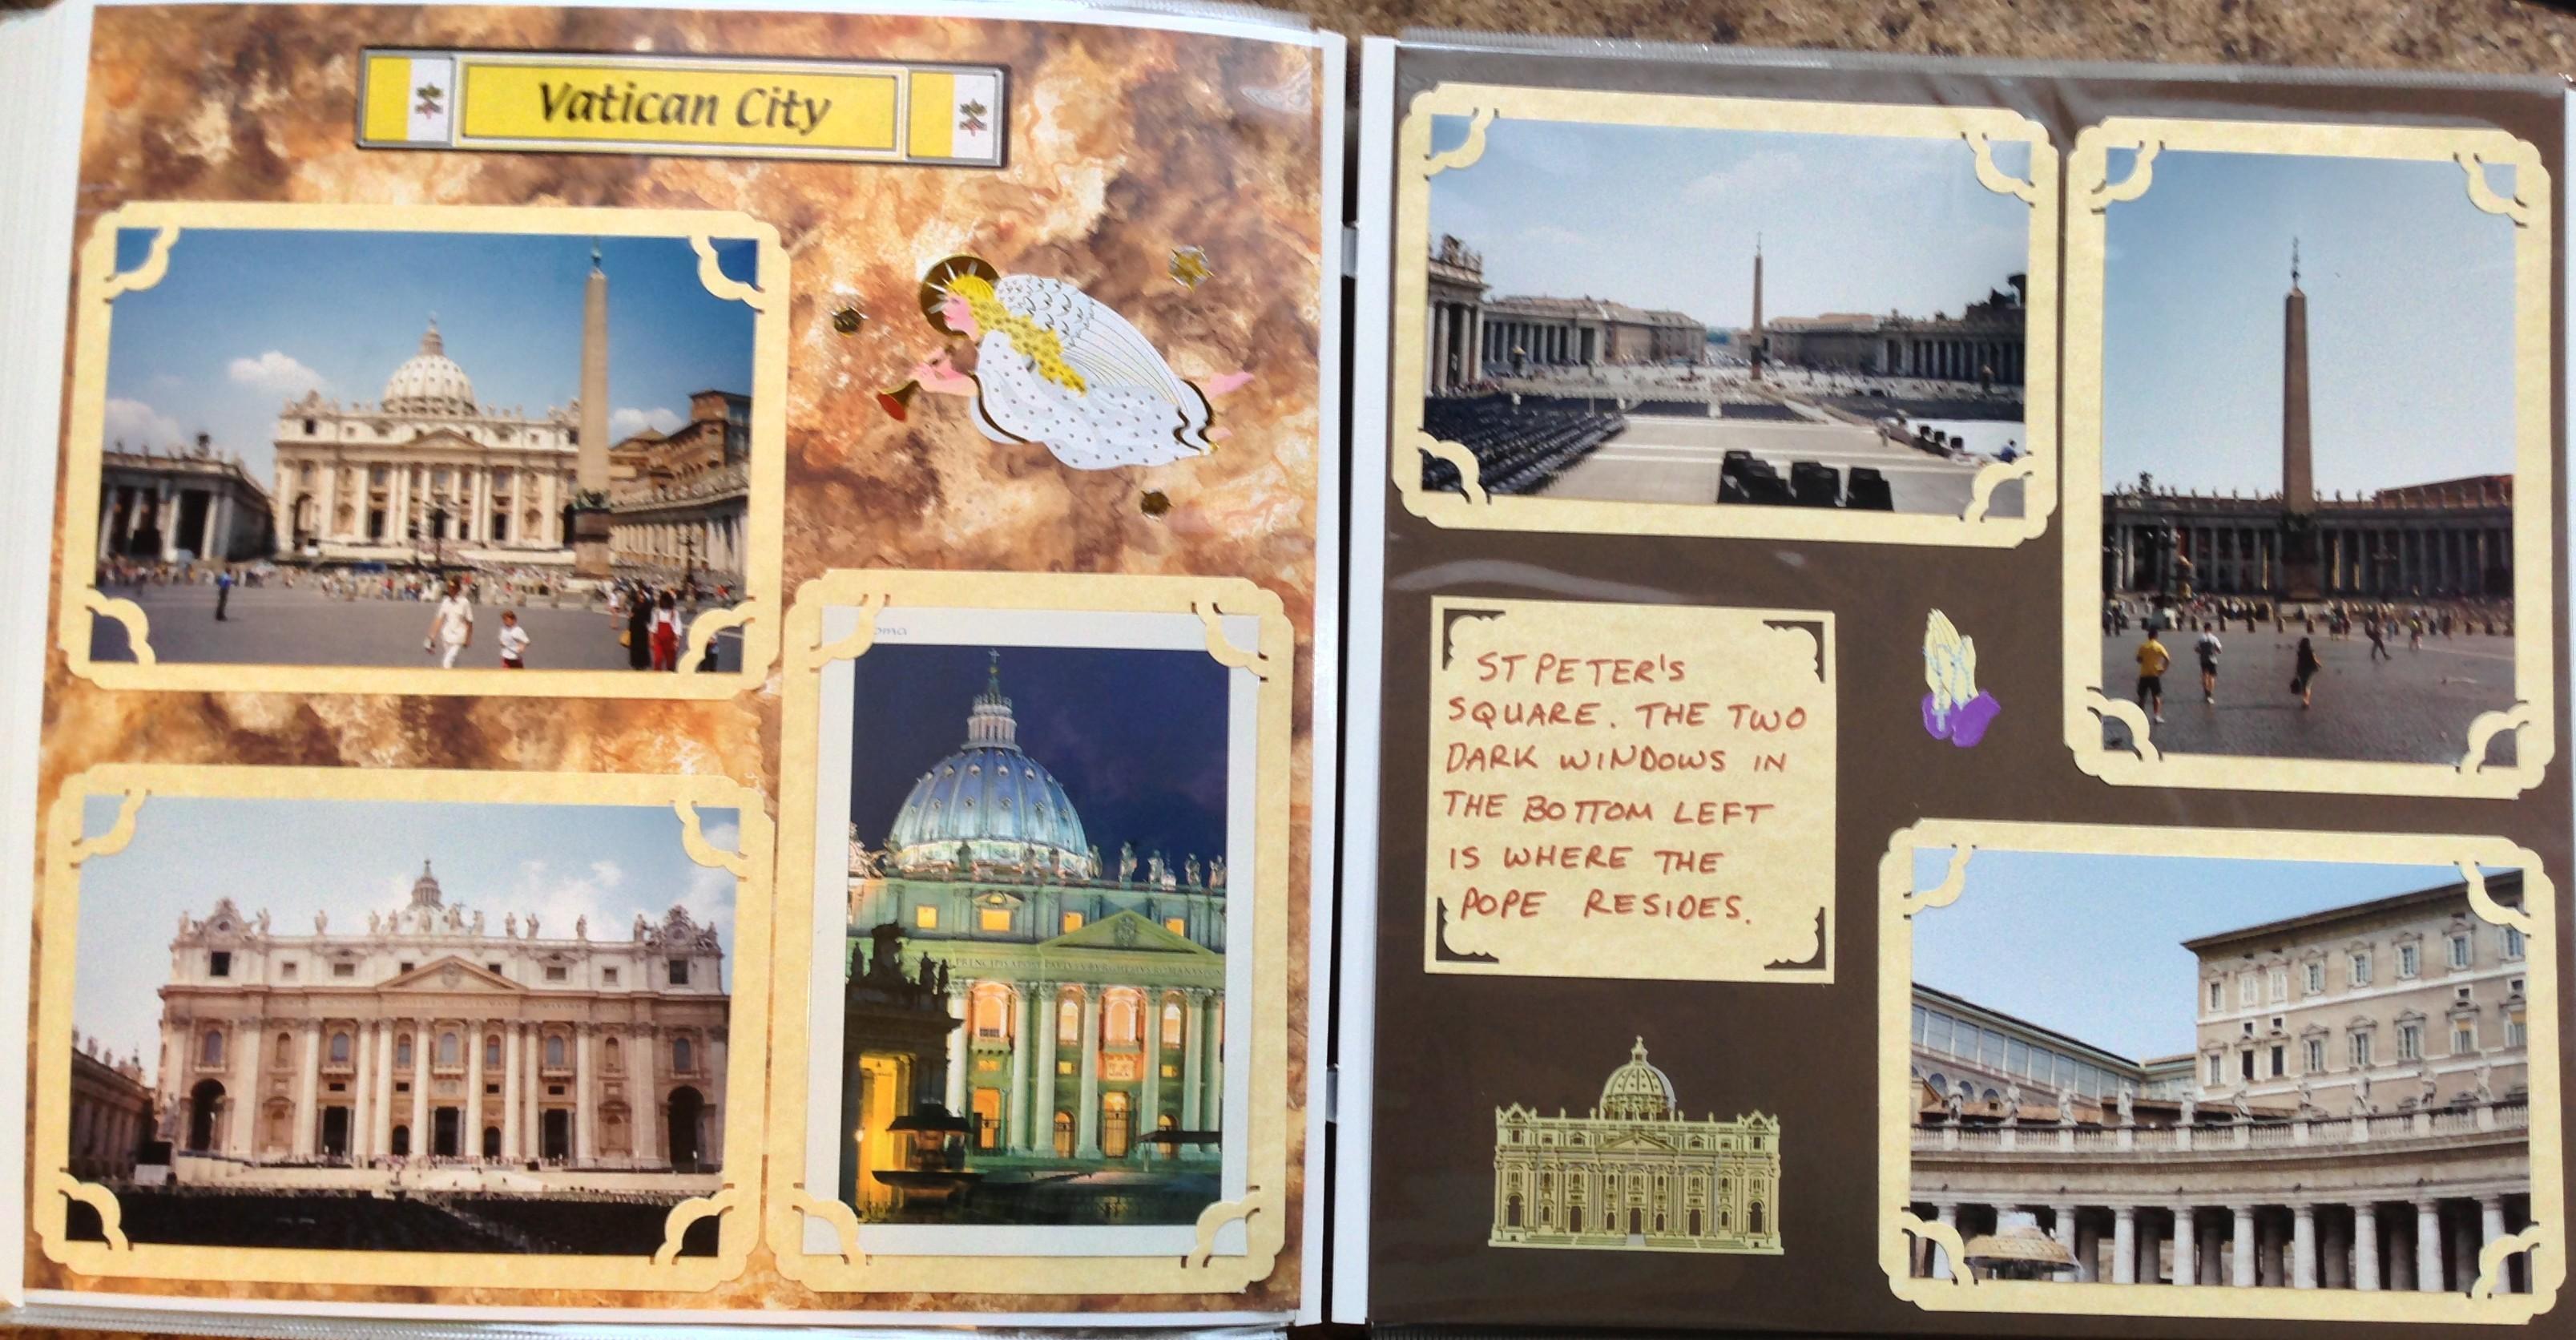 Europe scrapbook ideas - Europe Vacation Vatican City